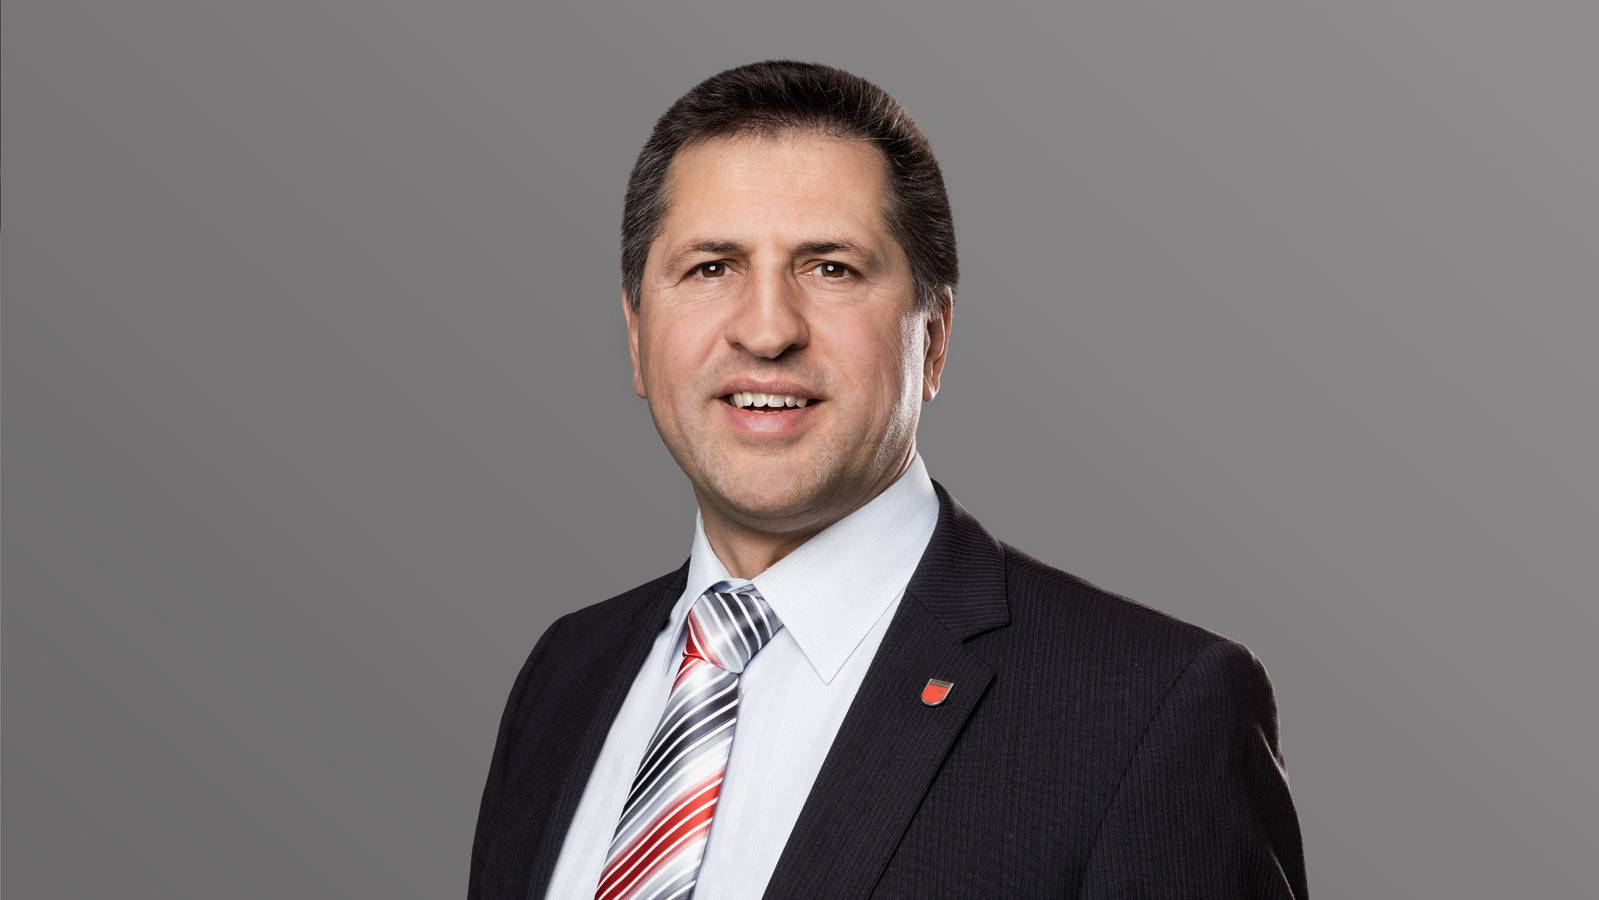 Sandro Patierno (CVP)